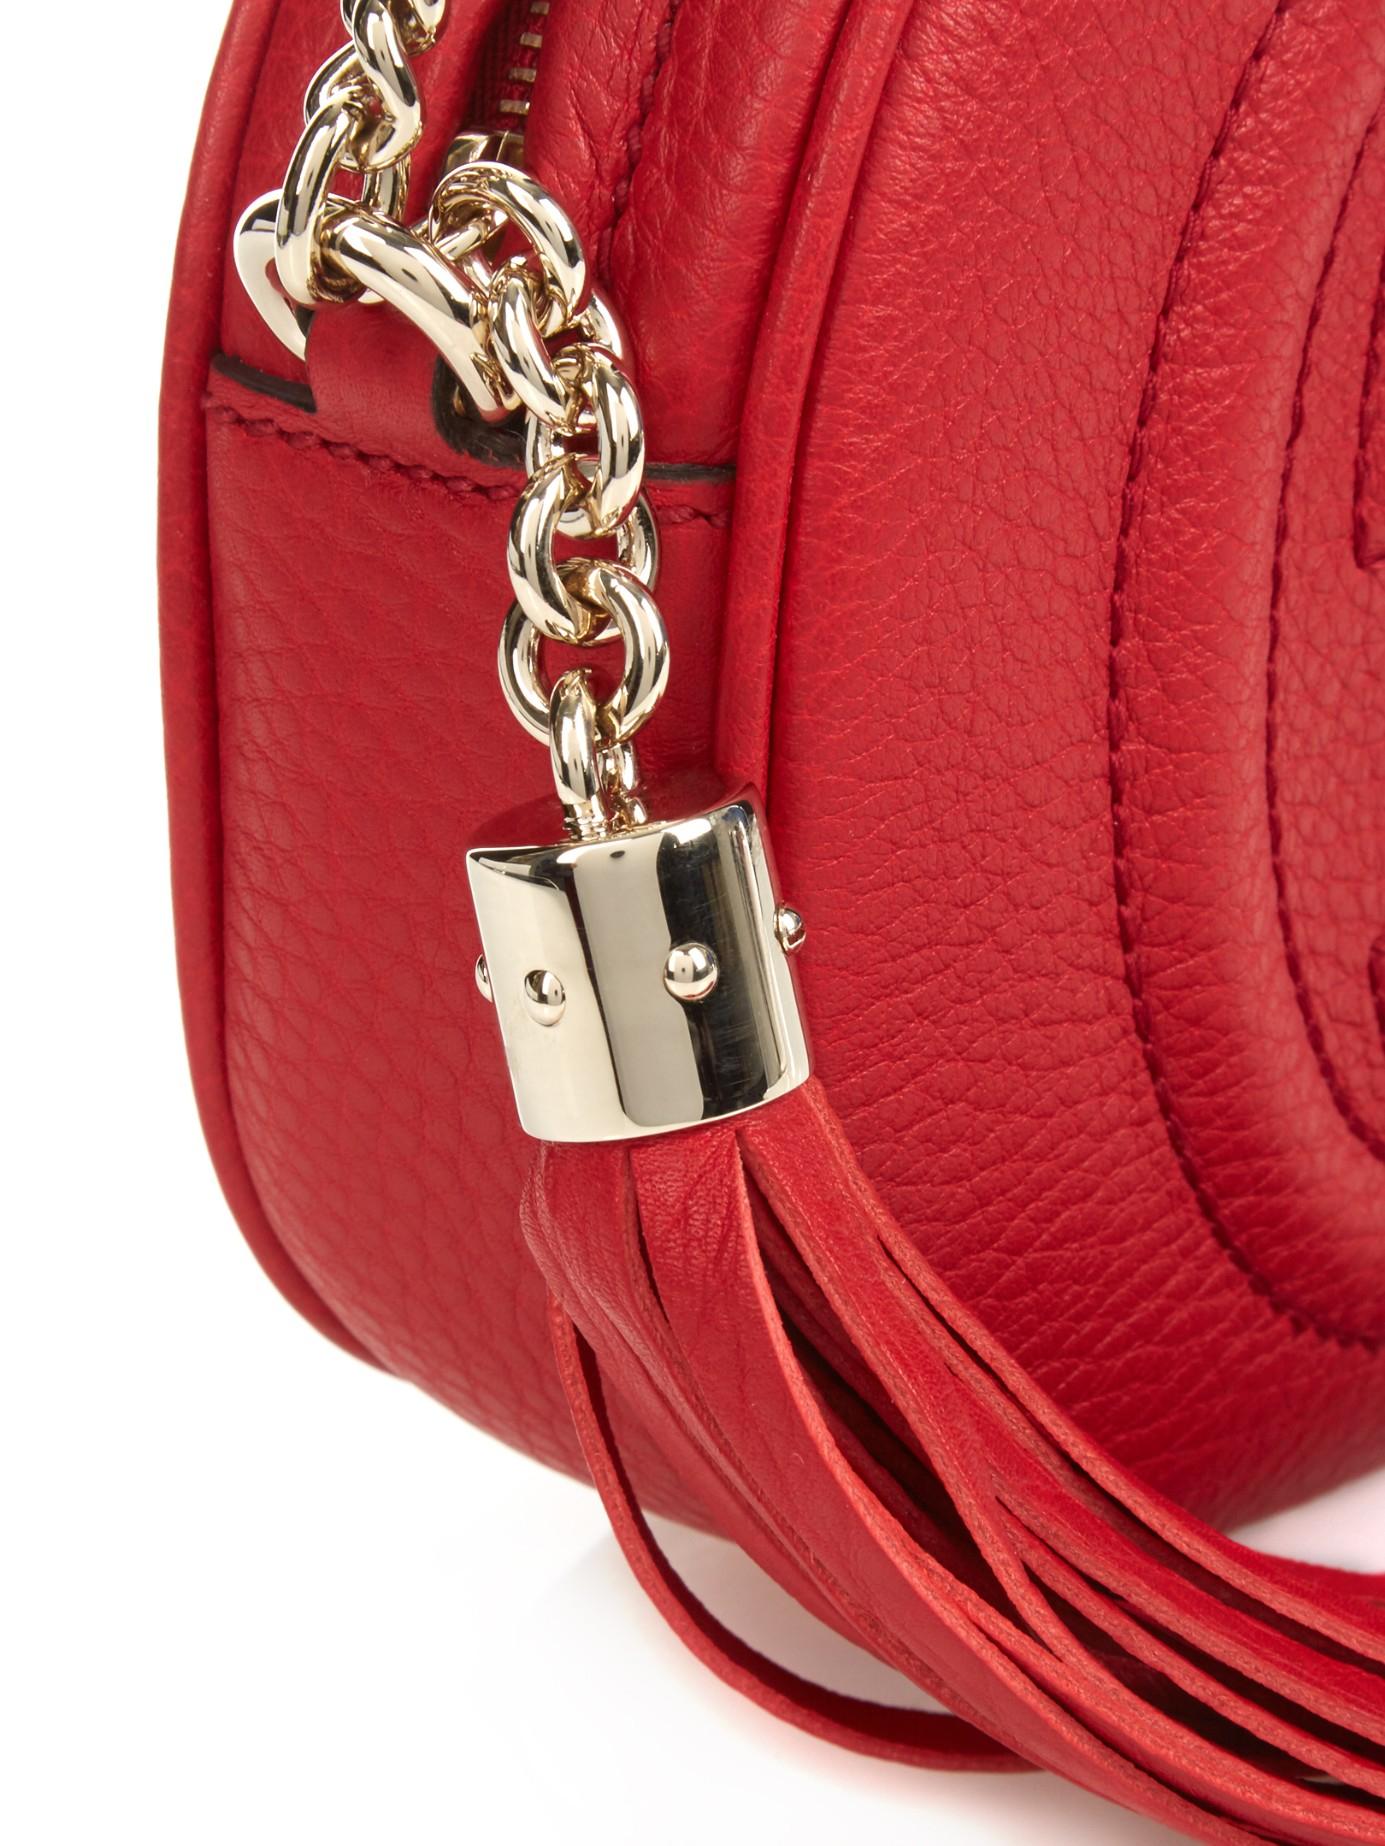 6f54f303ad2f Lyst - Gucci Mini Soho Chain-Strap Cross-Body Bag in Red